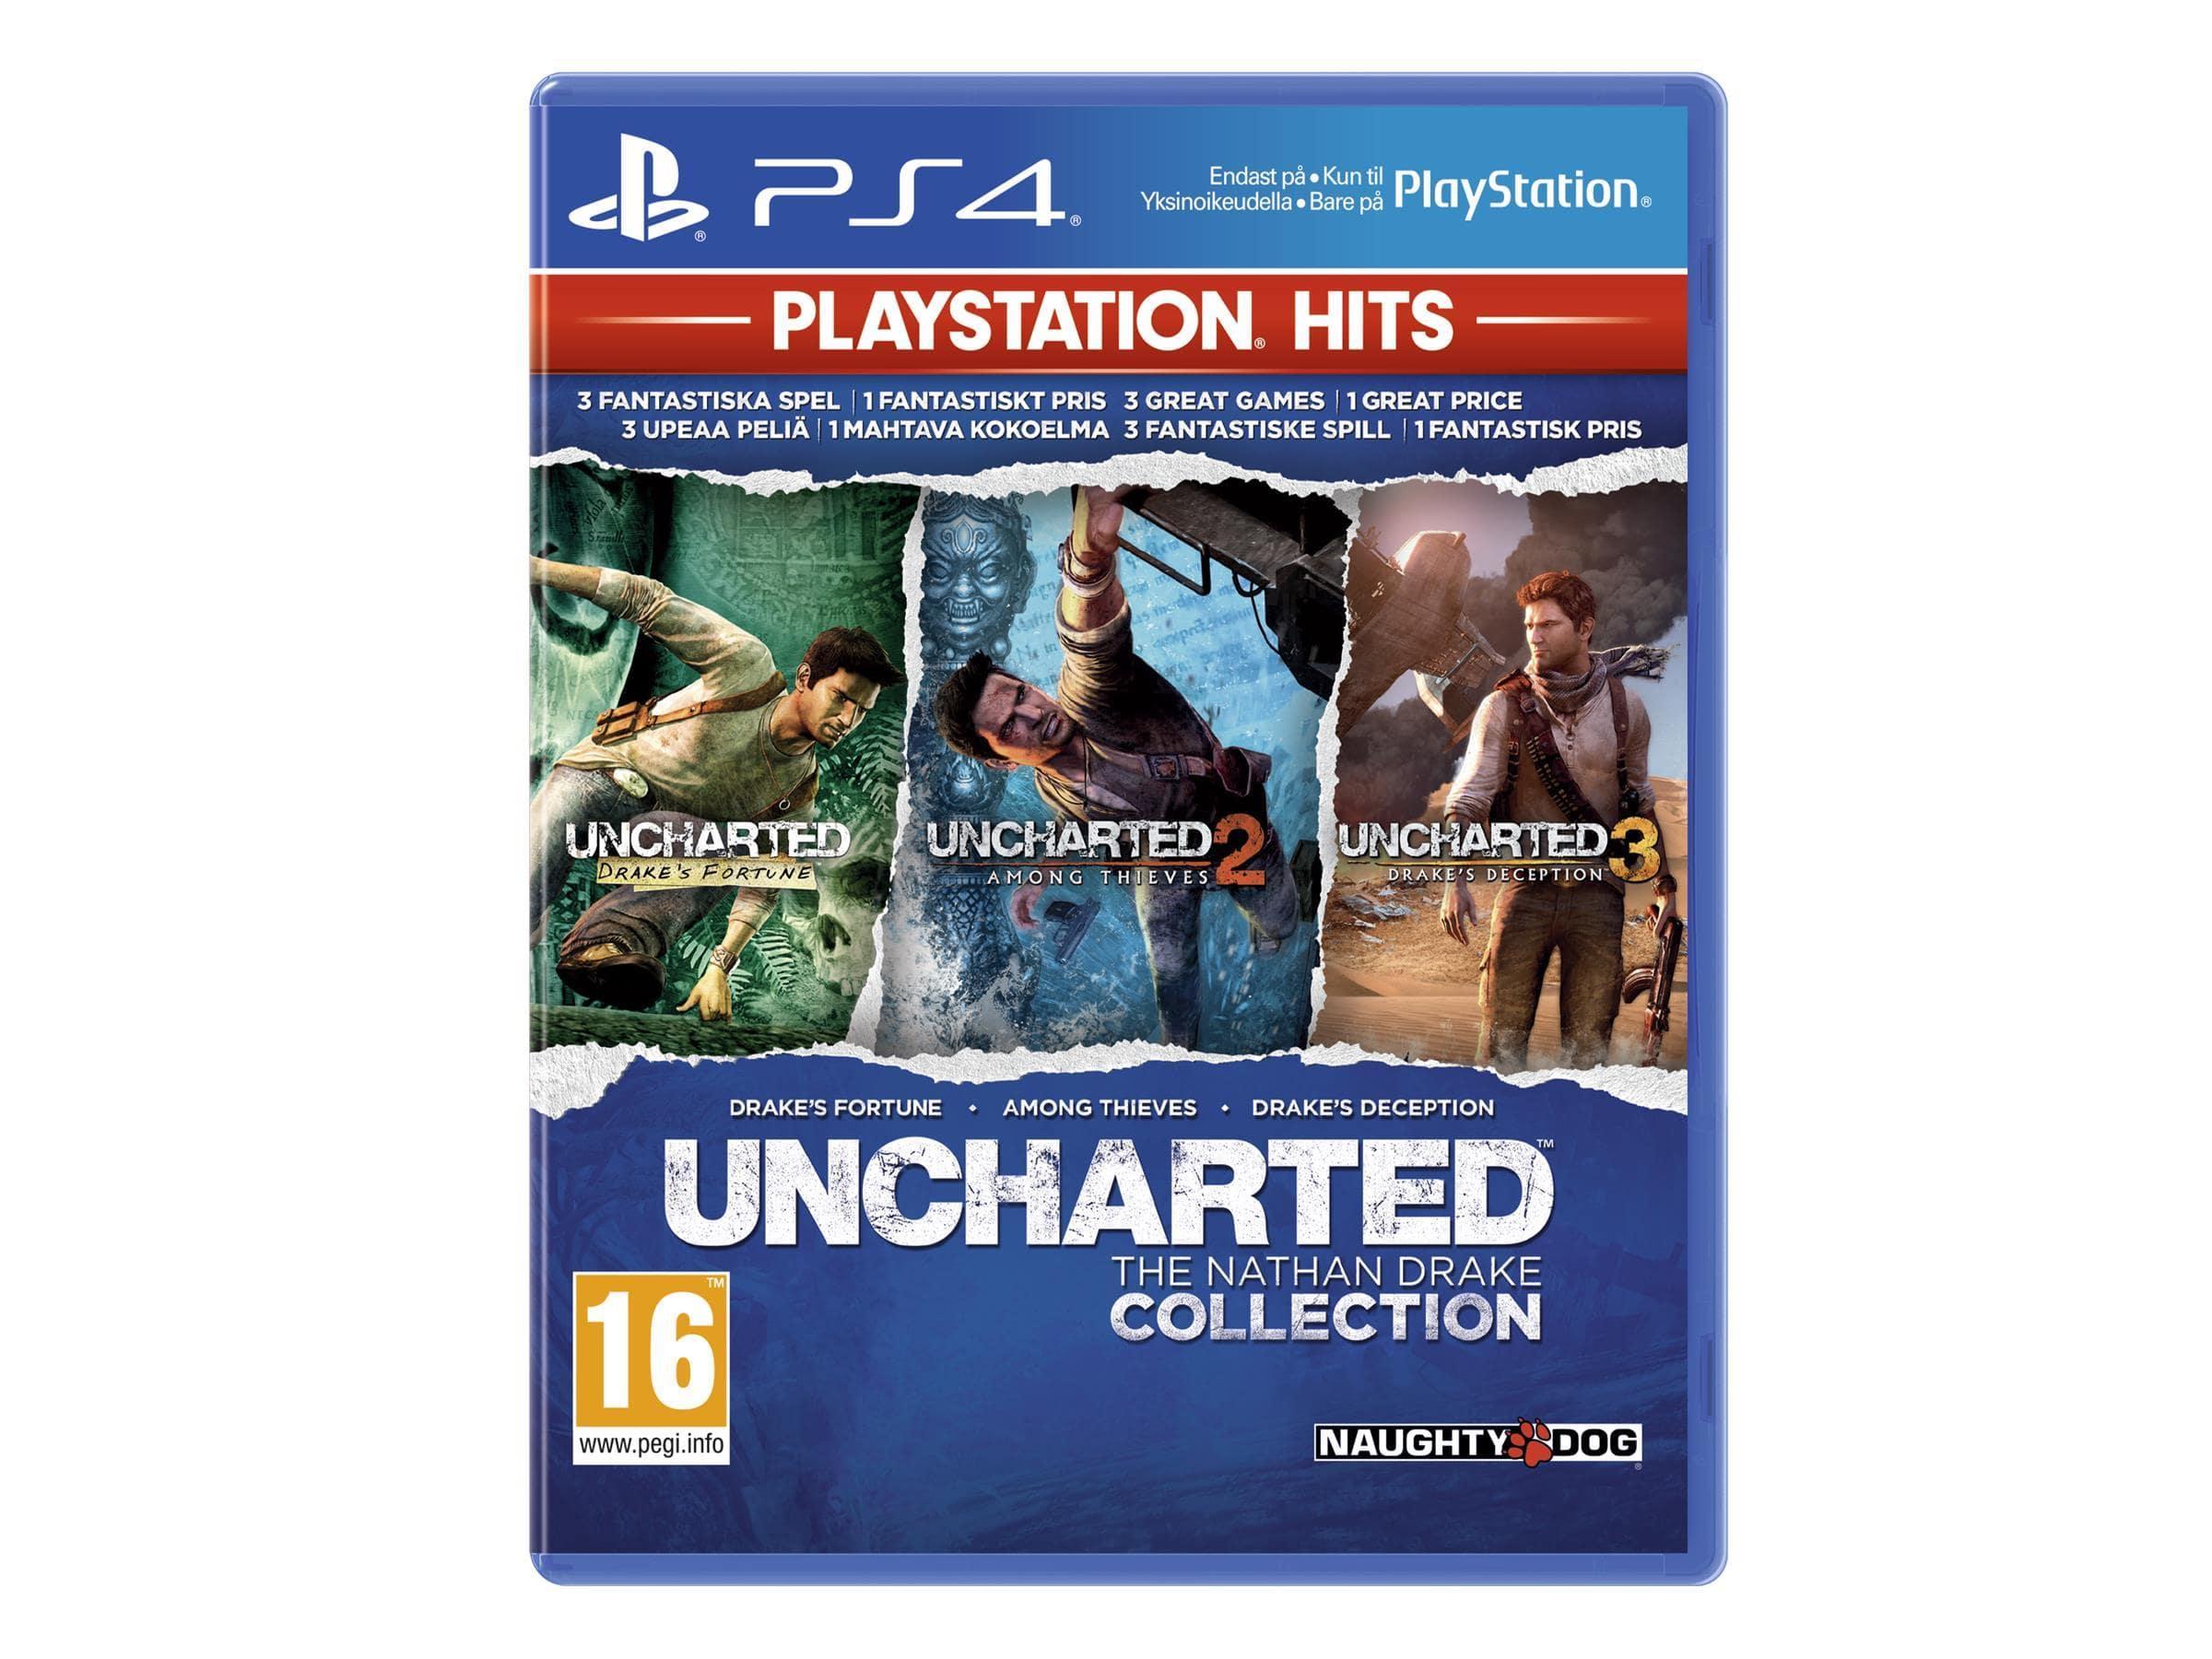 Uncharted: The Nathan Drake Collection (Playstation Hits)